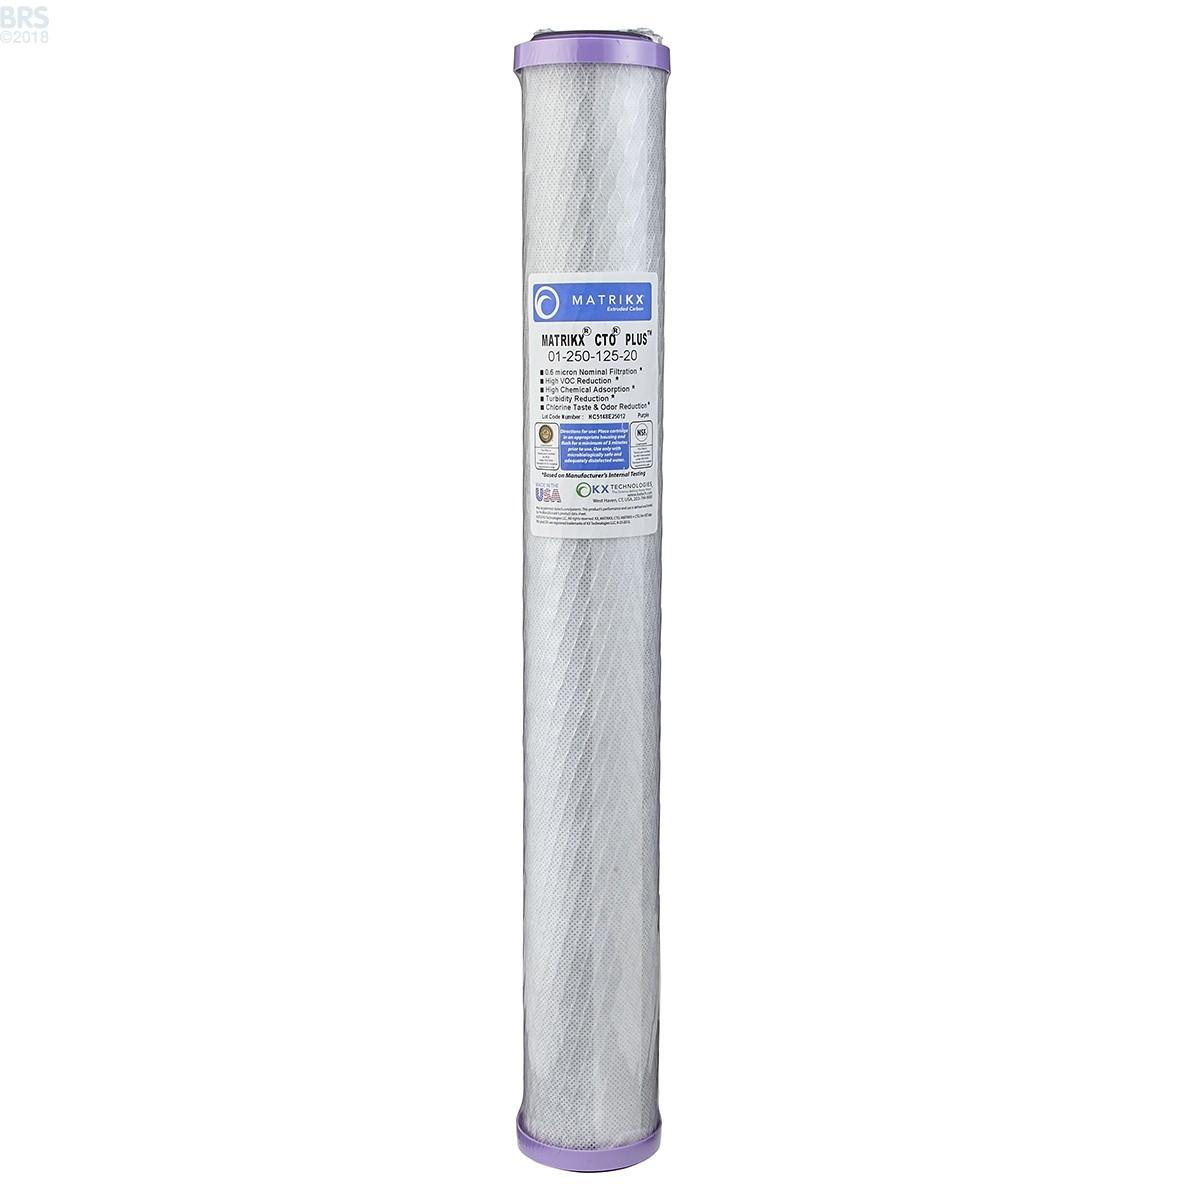 Matrikx Cto Plus Carbon Block 1 Micron Filters Nano Cartridge Filter Air Water 10 03 U Mikron